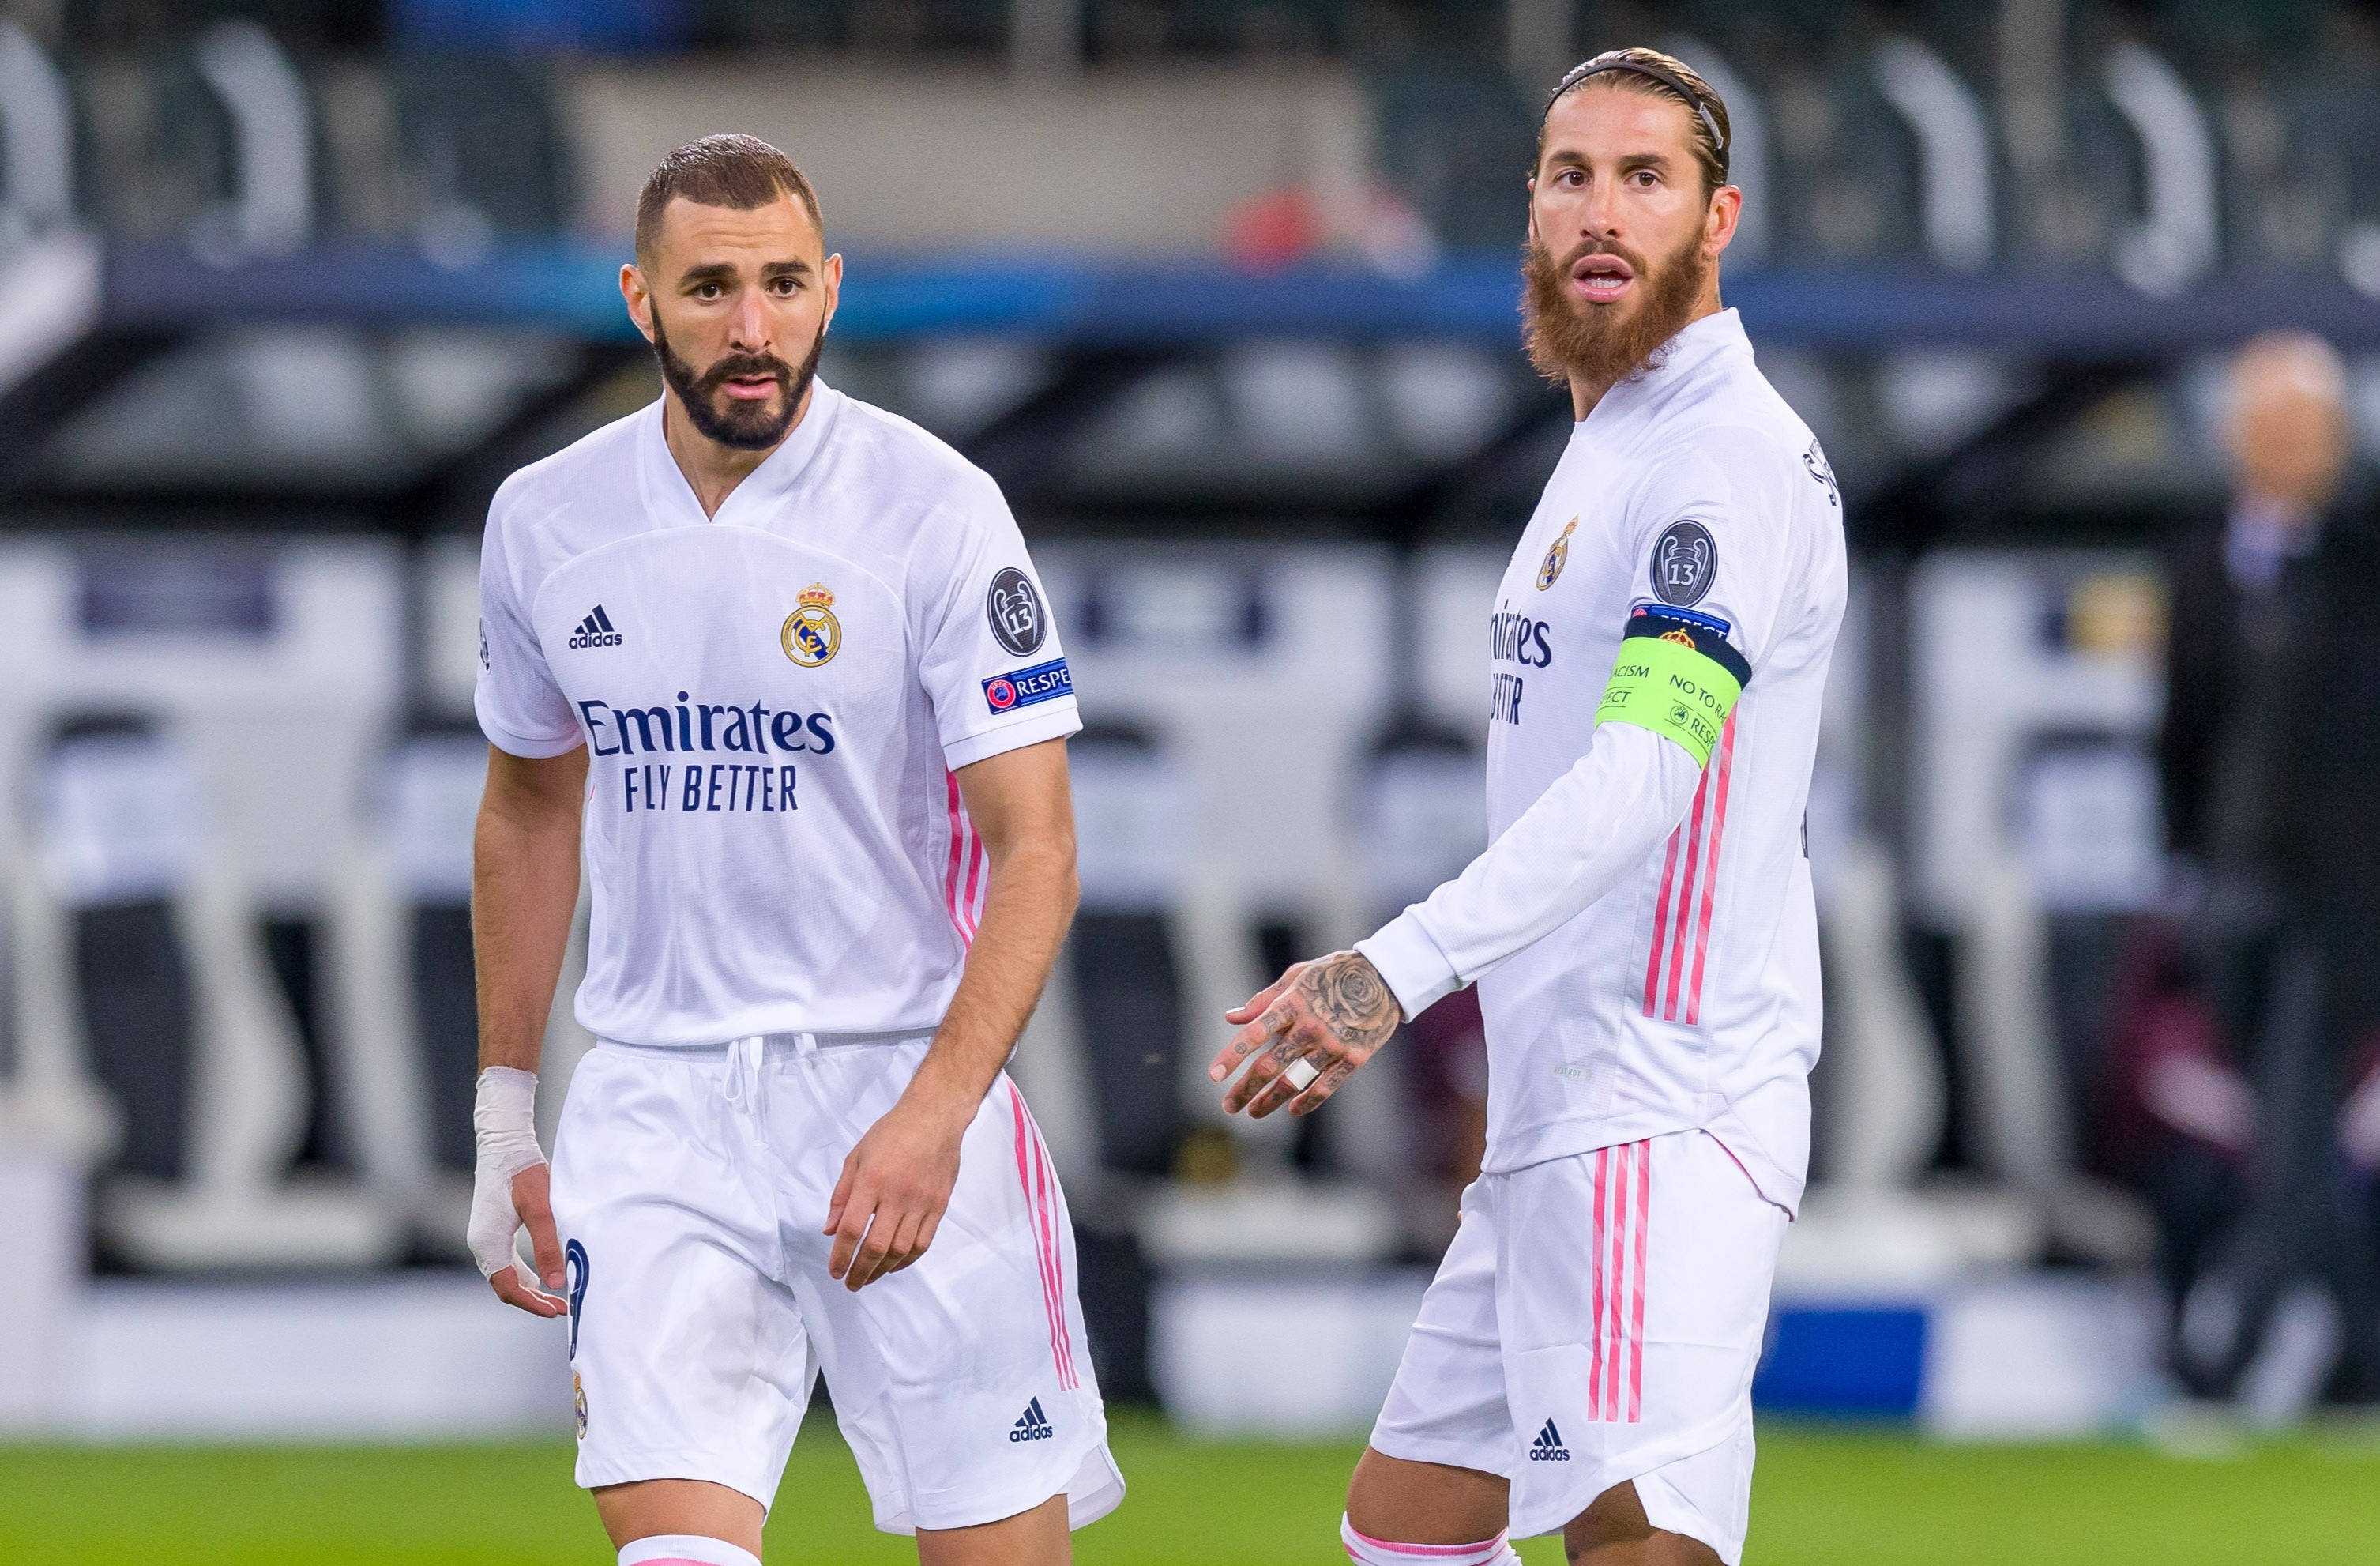 09/12/2020 Daily Predictions: UEFA Champions League 2020-21, Real Madrid vs. Borussia Monchengladbach